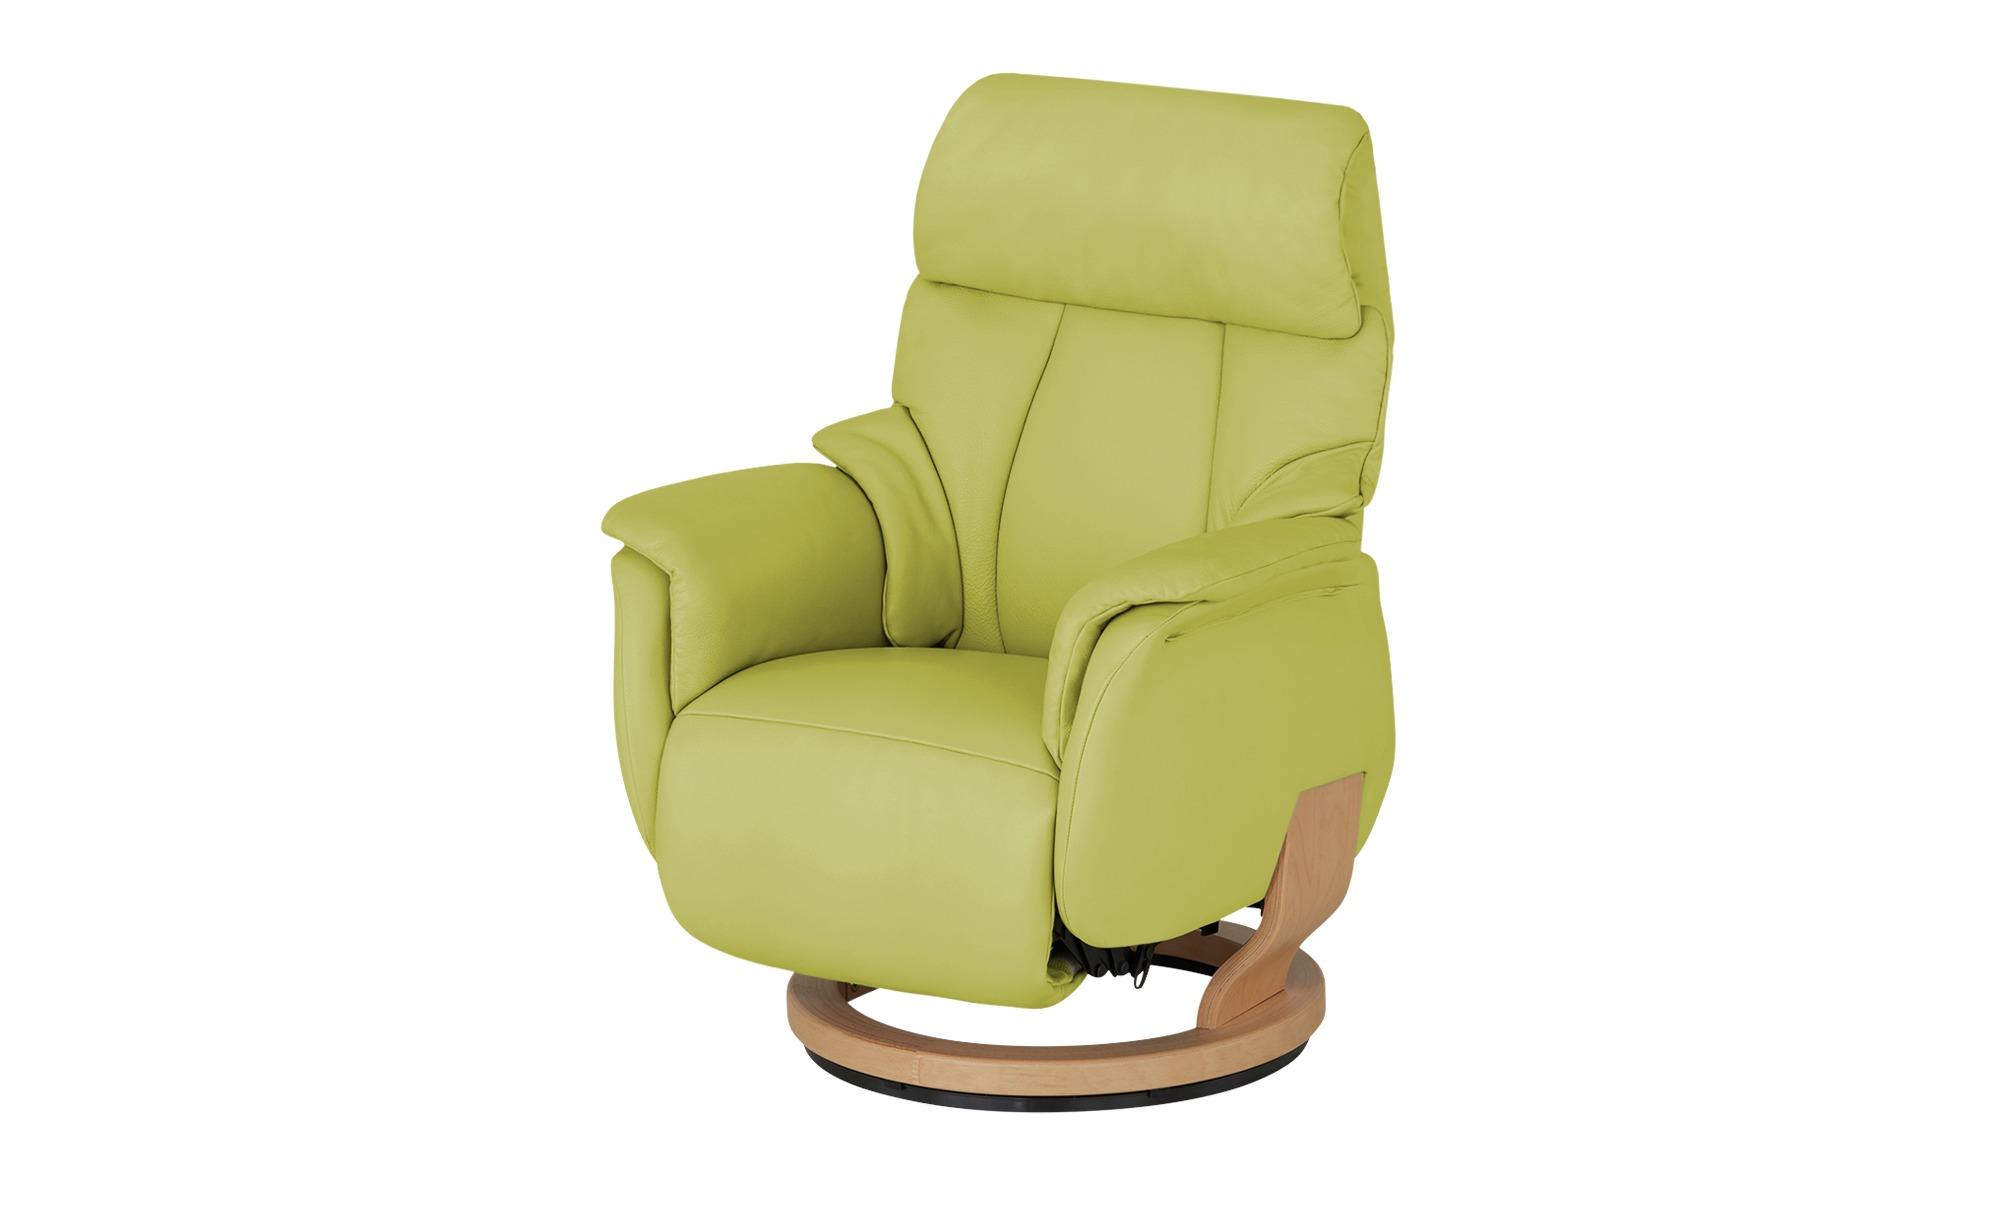 Nils Olsen Drehsessel  Silas ¦ grün ¦ Maße (cm): B: 78 H: 105 T: 89 Polstermöbel > Sessel > Drehsessel - Höffner